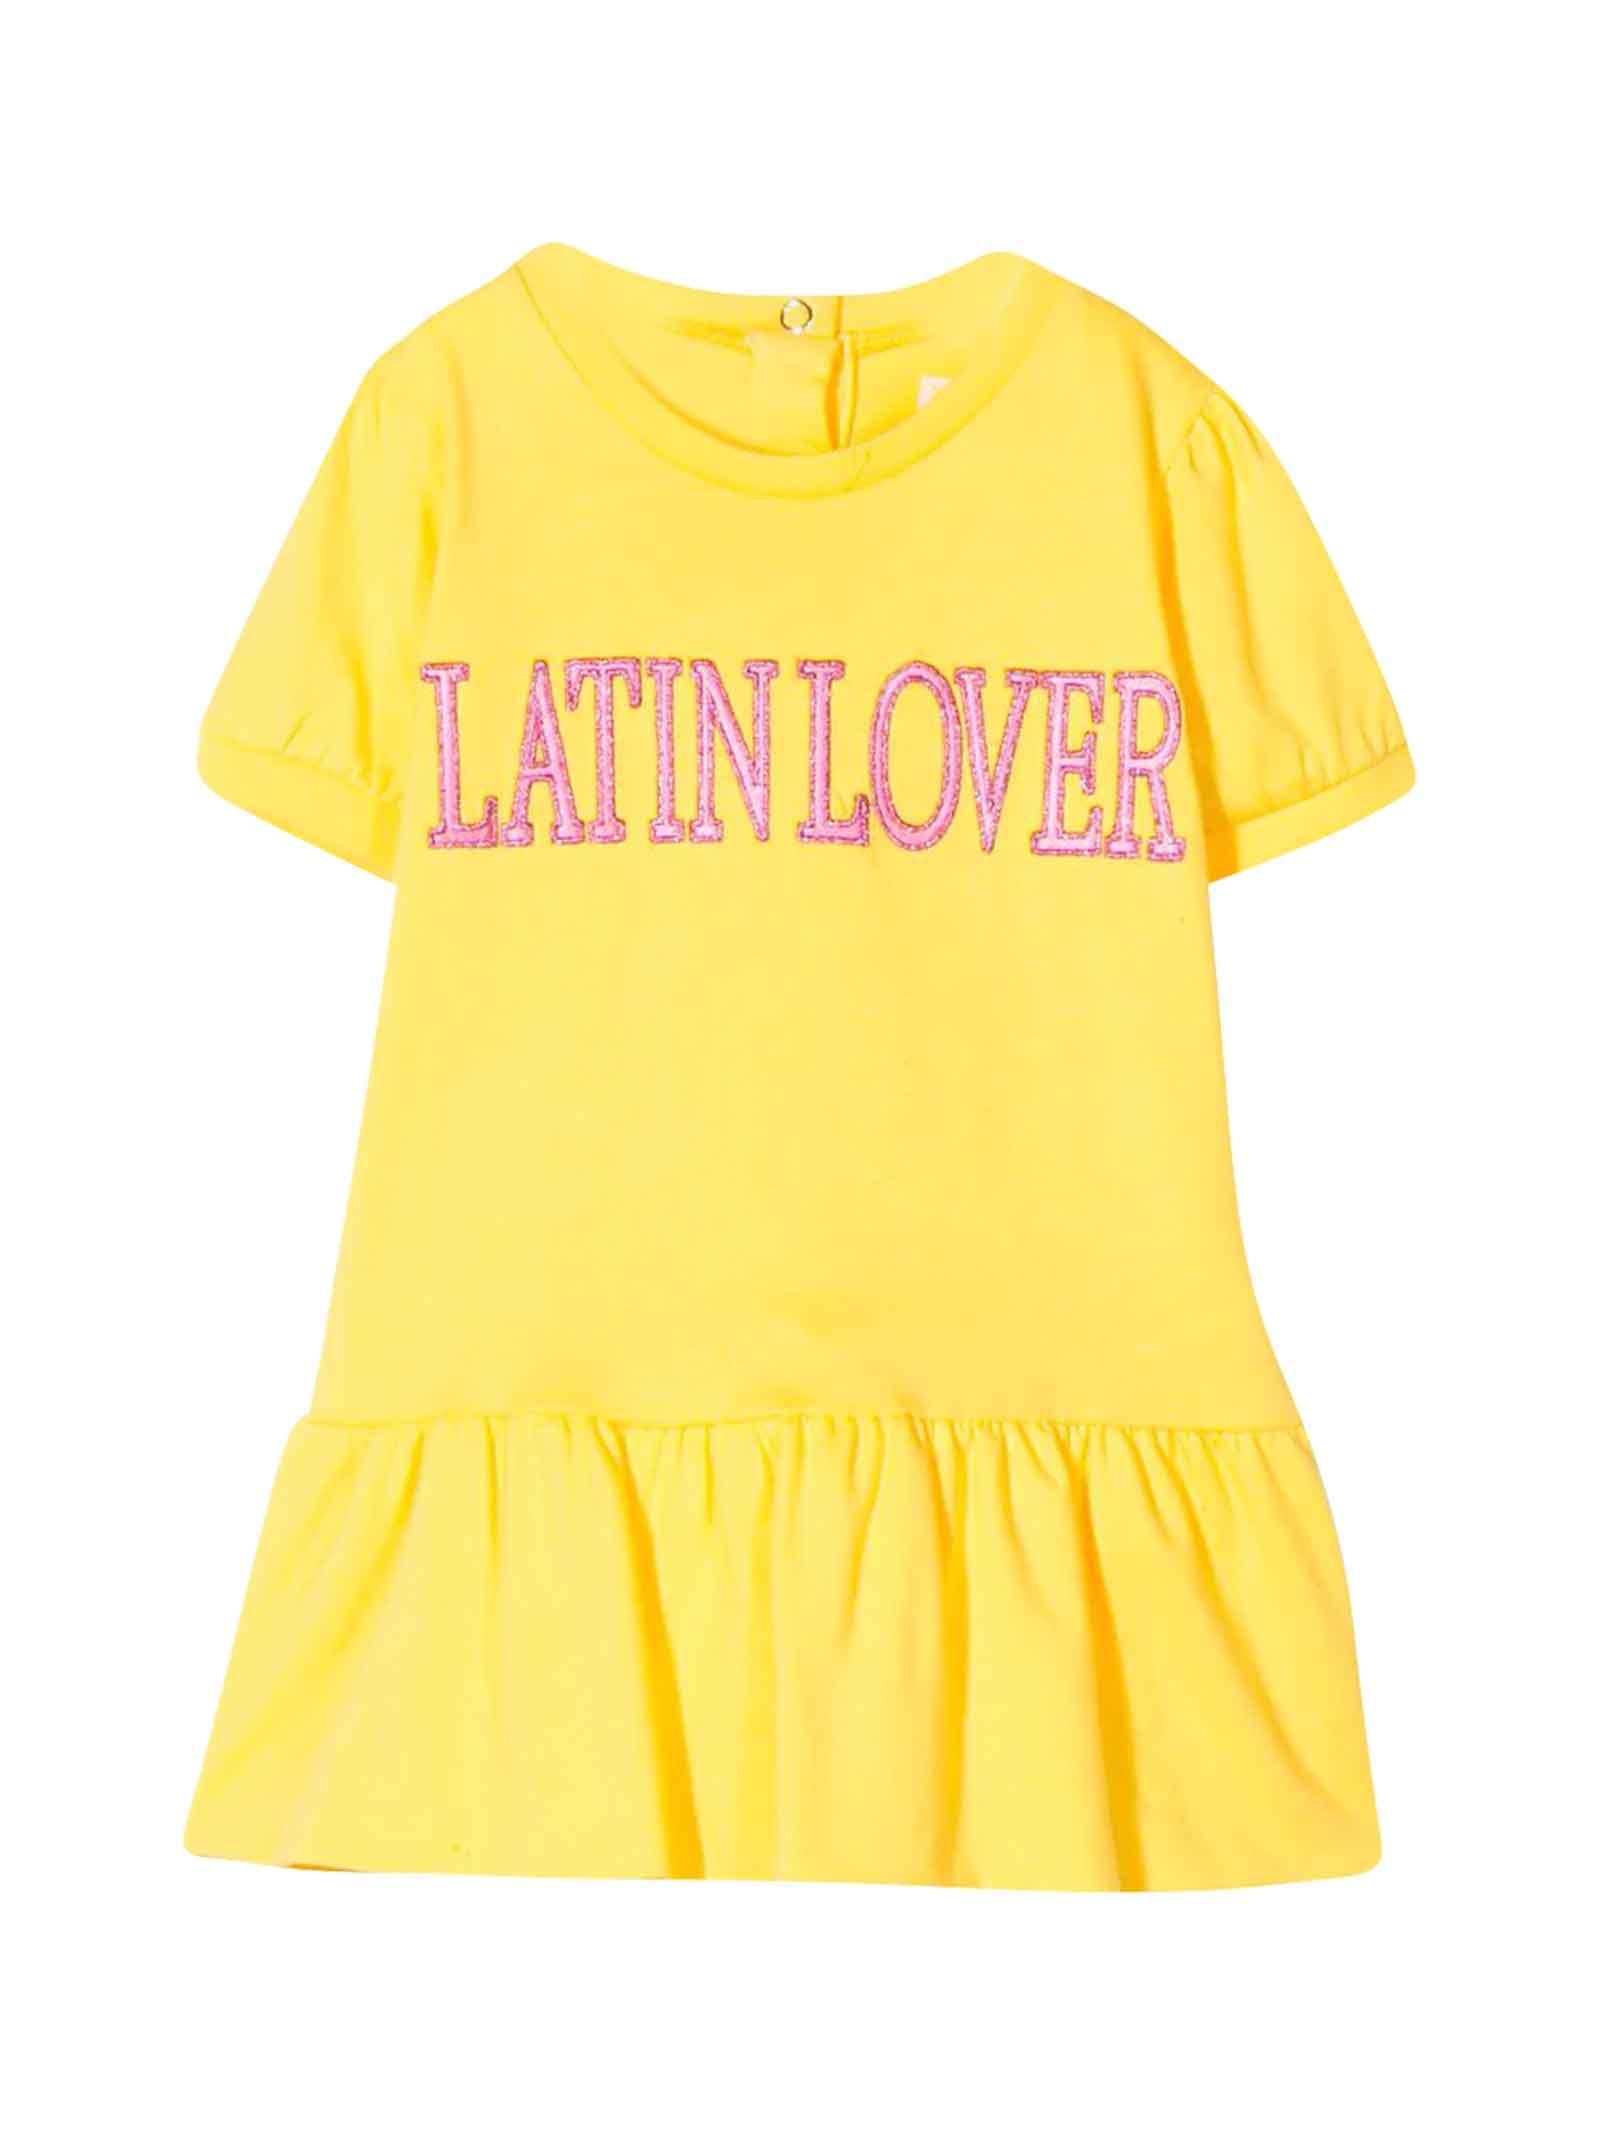 Buy Alberta Ferretti Yellow Dress With Press Alberta Ferretti online, shop Alberta Ferretti with free shipping